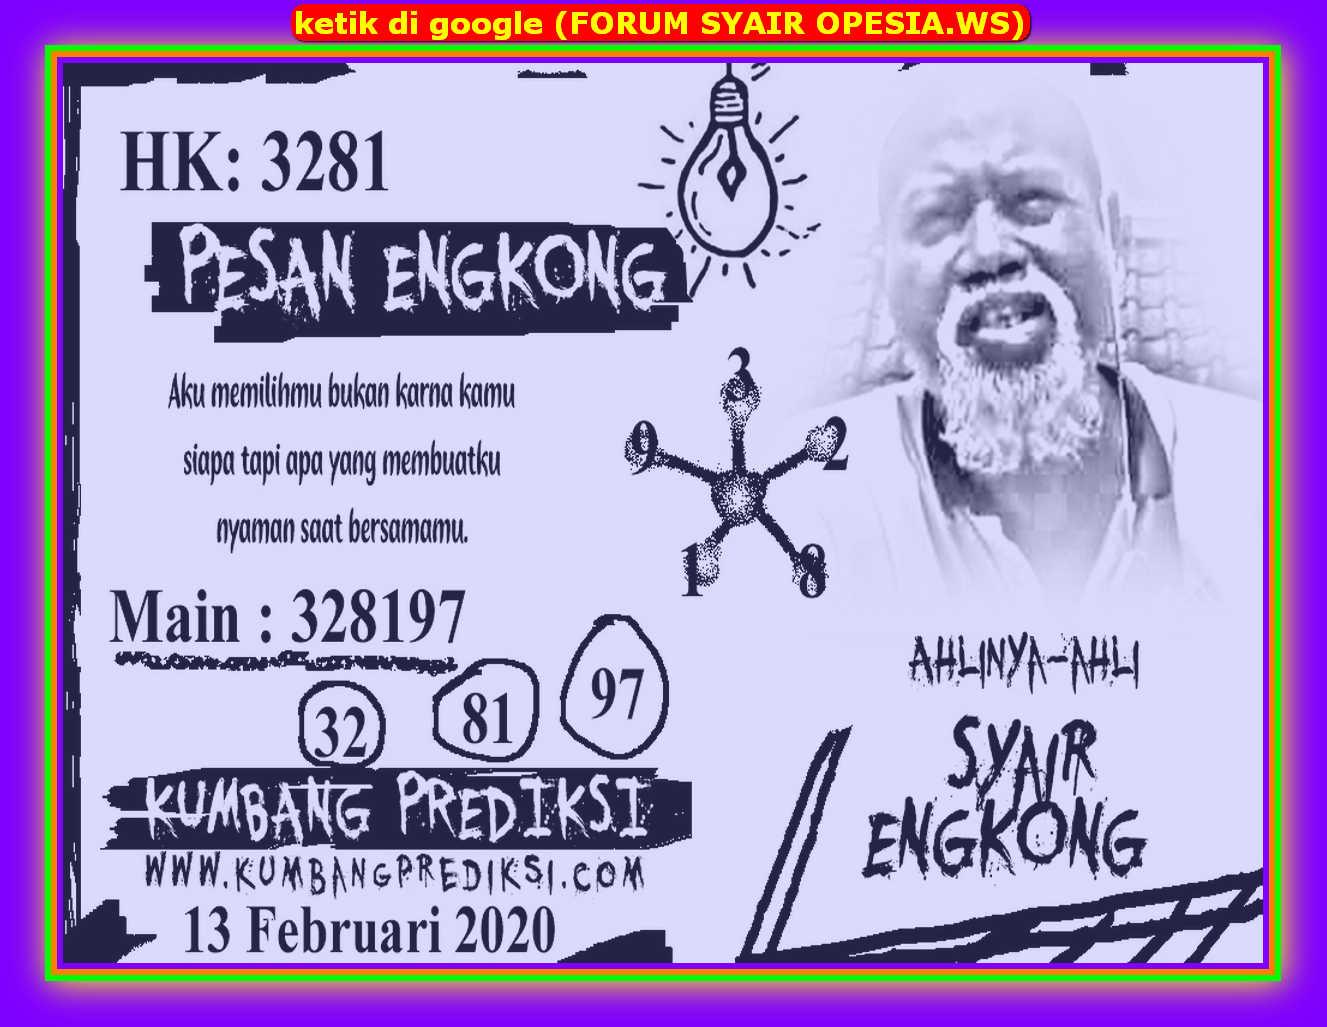 Kode syair Hongkong Kamis 13 Februari 2020 88